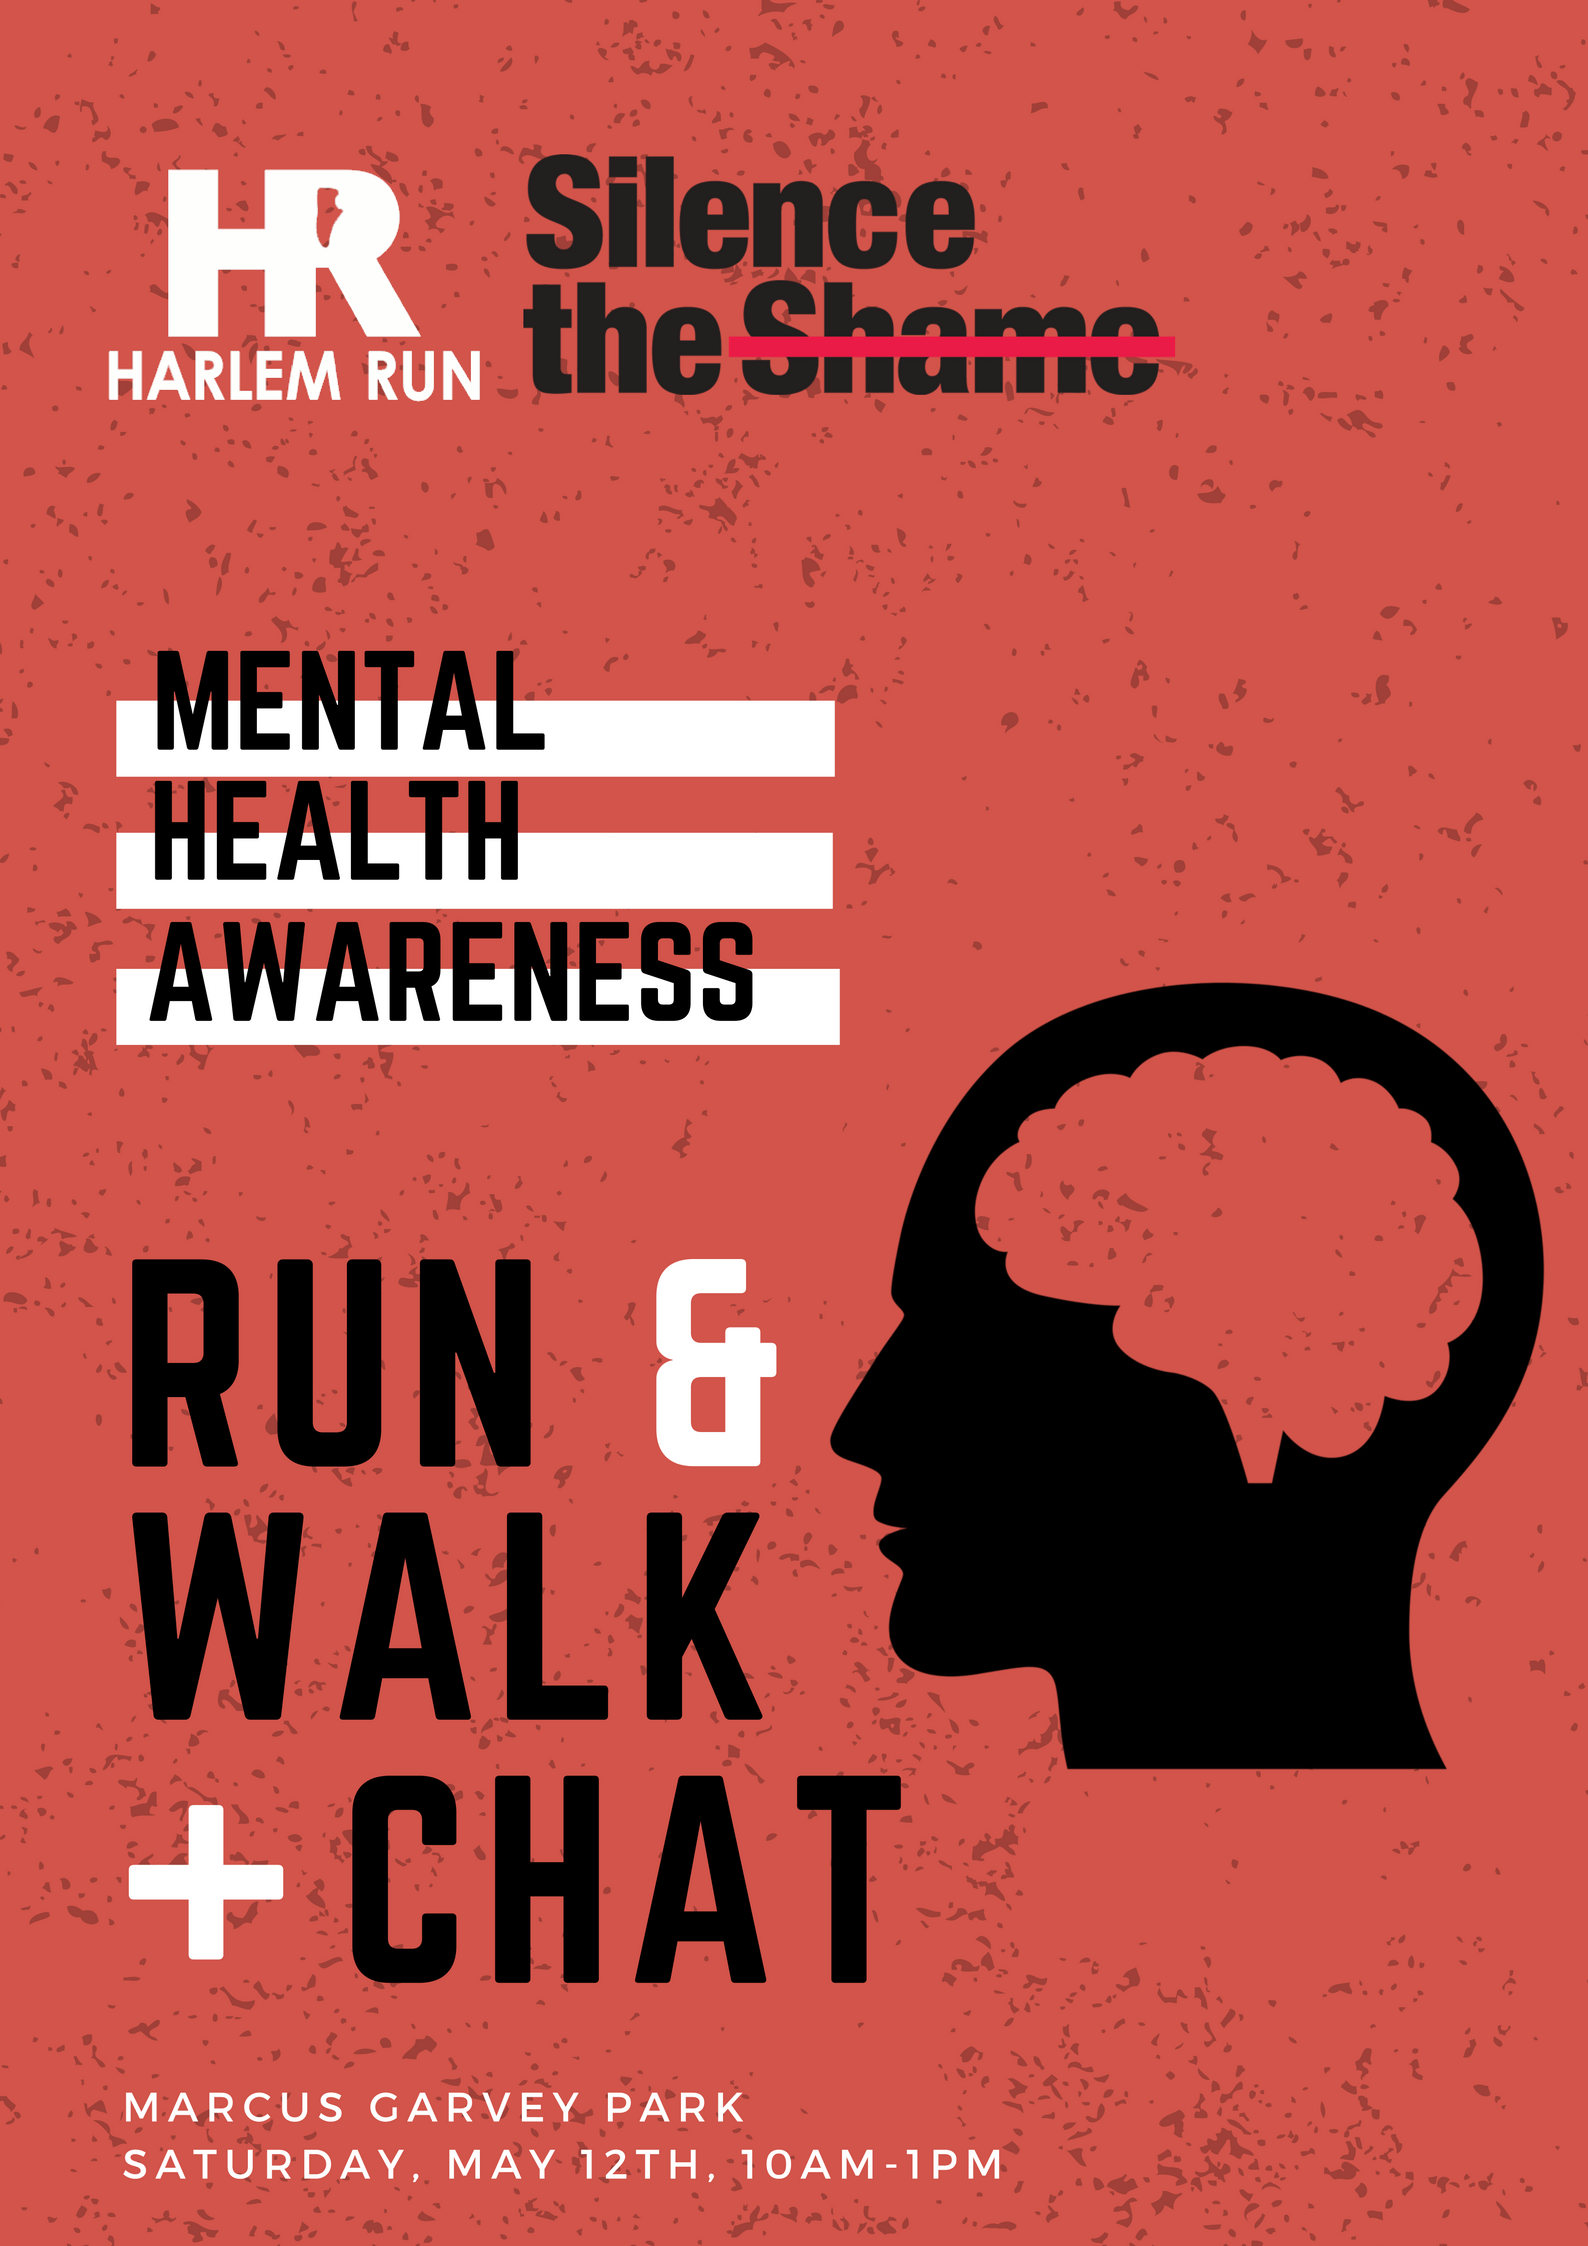 Silence the Shame + Harlem Run 5K Run/Walk